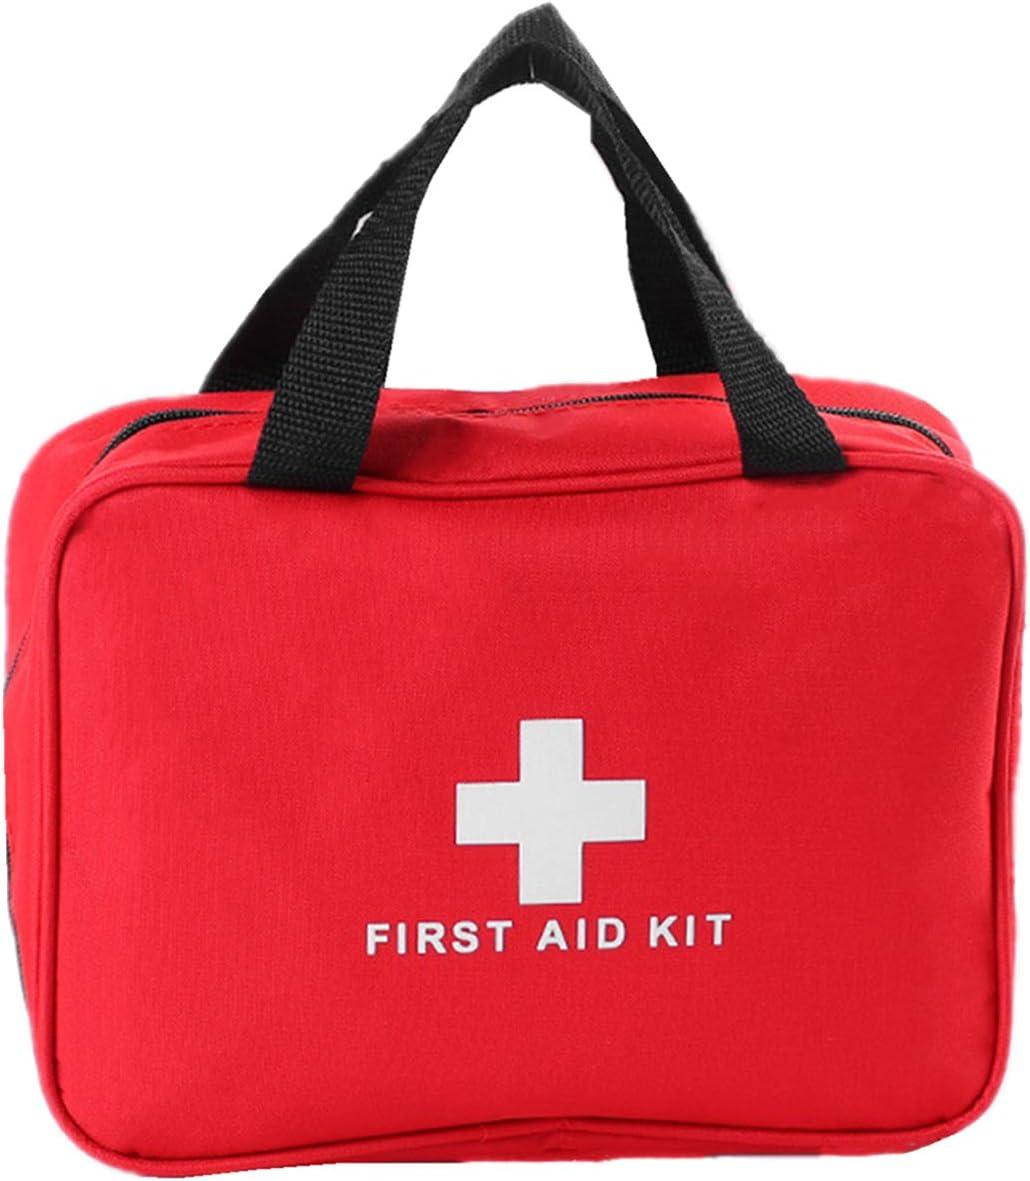 PAXLamb First Aid Bag Kit Storage Empty online shop Re Popular standard Medical